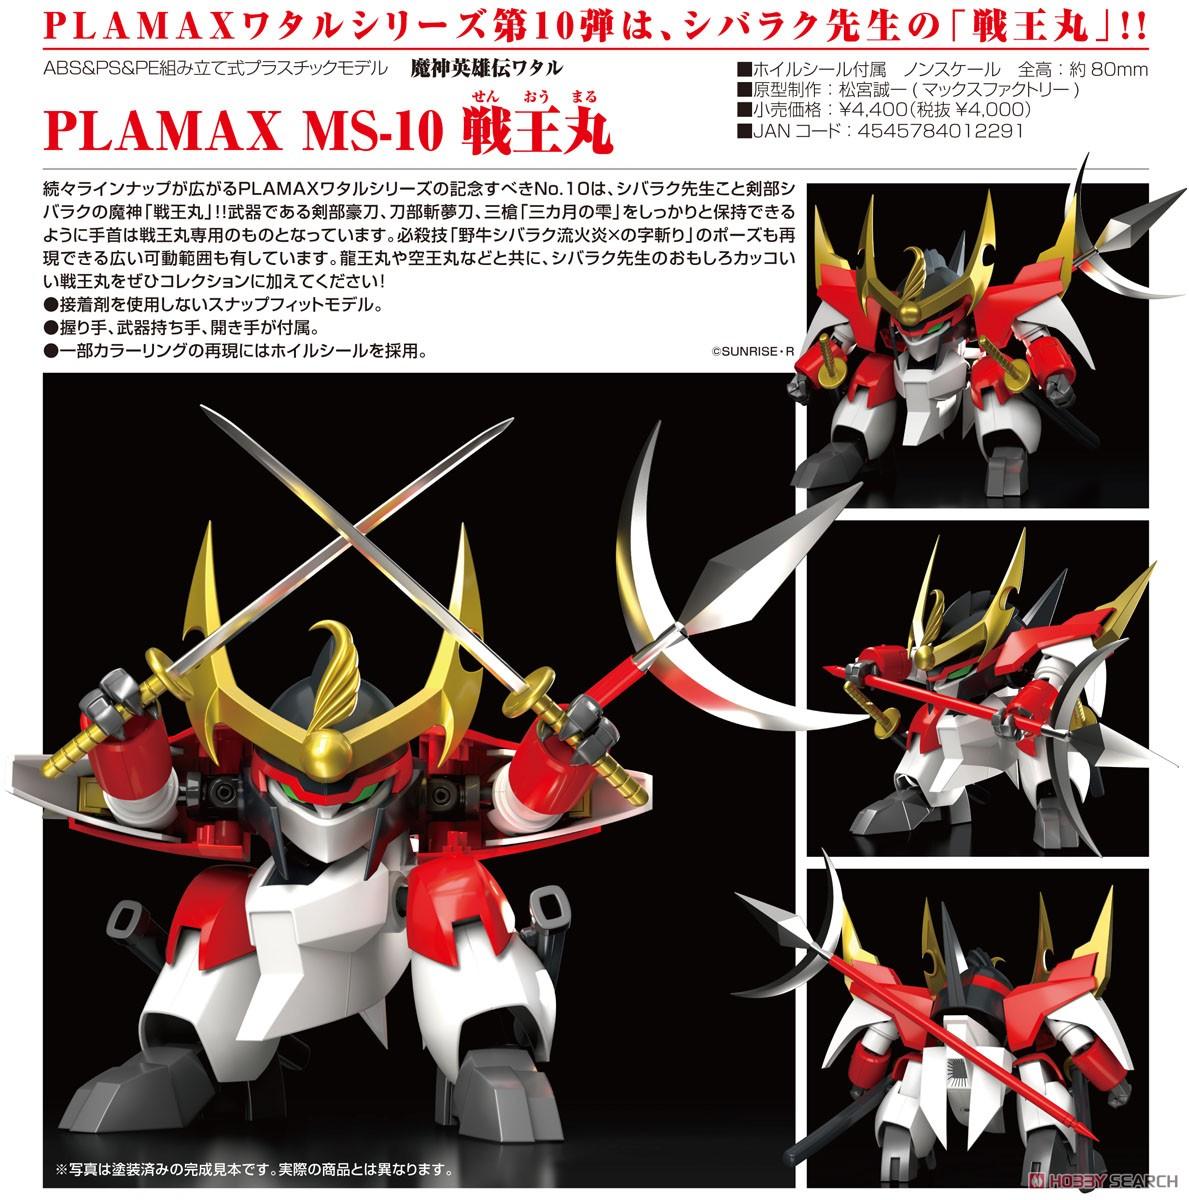 PLAMAX MS-10『戦王丸』魔神英雄伝ワタル プラモデル-005